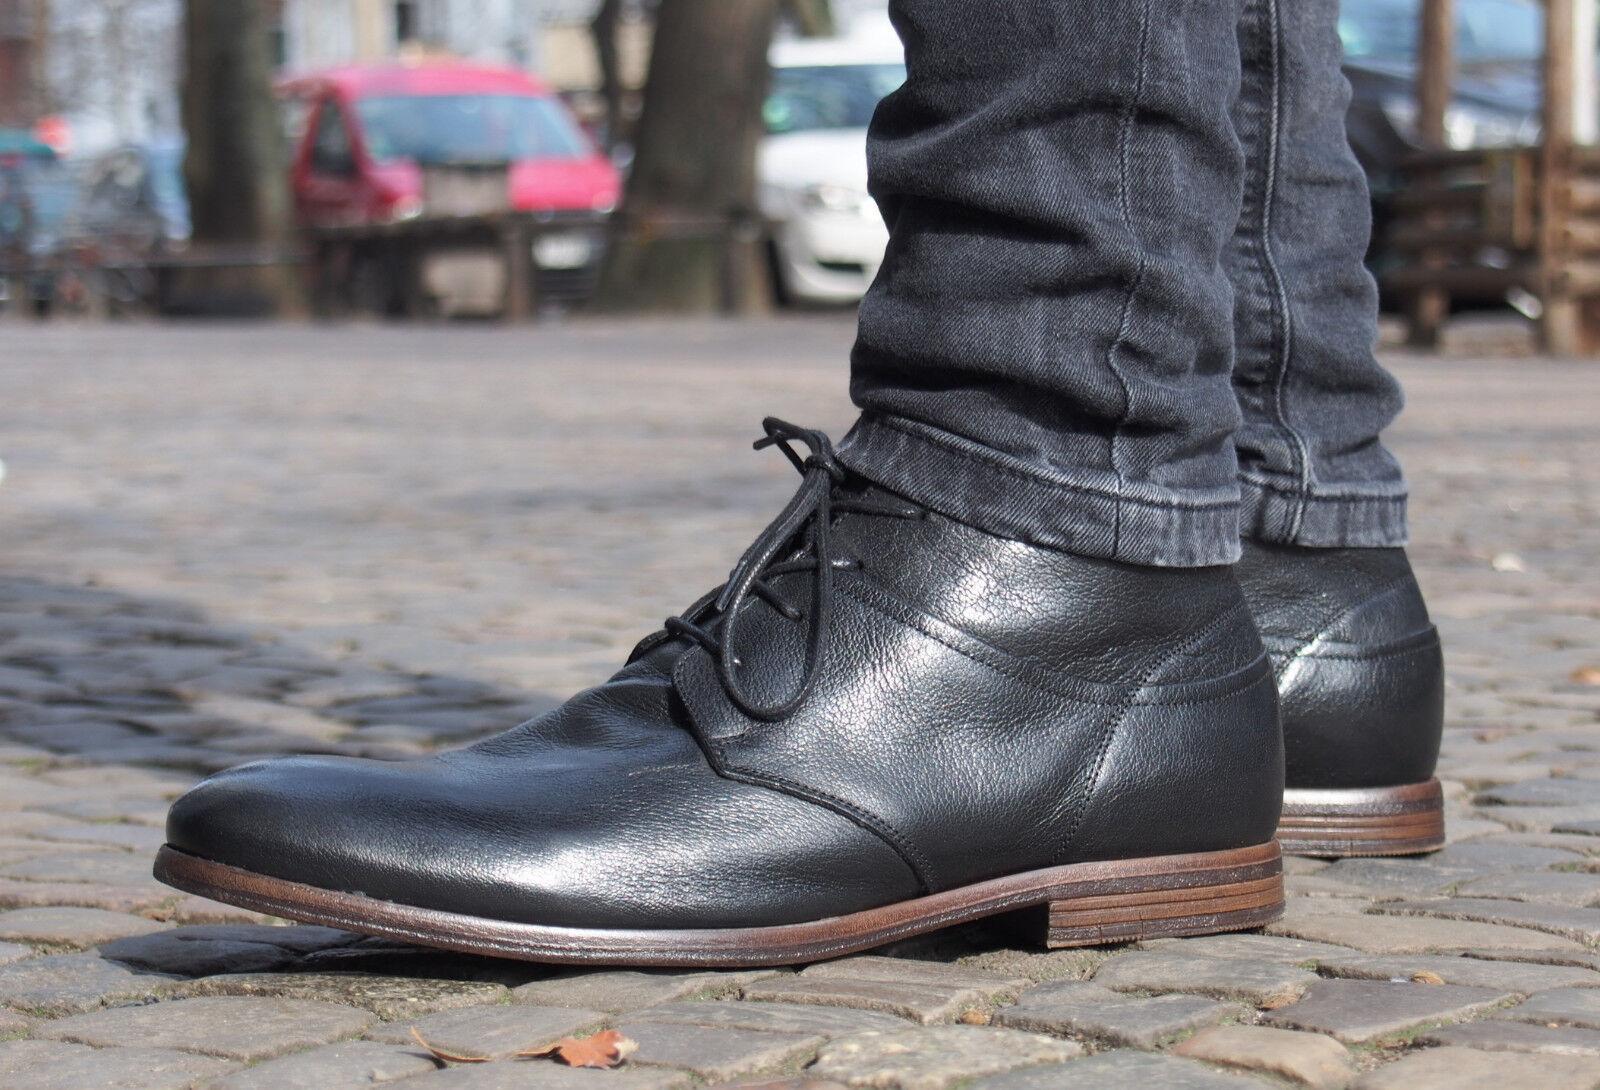 COXX BORBA Schuhe PILAU600 schwarz Herrenschuhe Echtleder Schnürschuhe rotuziert